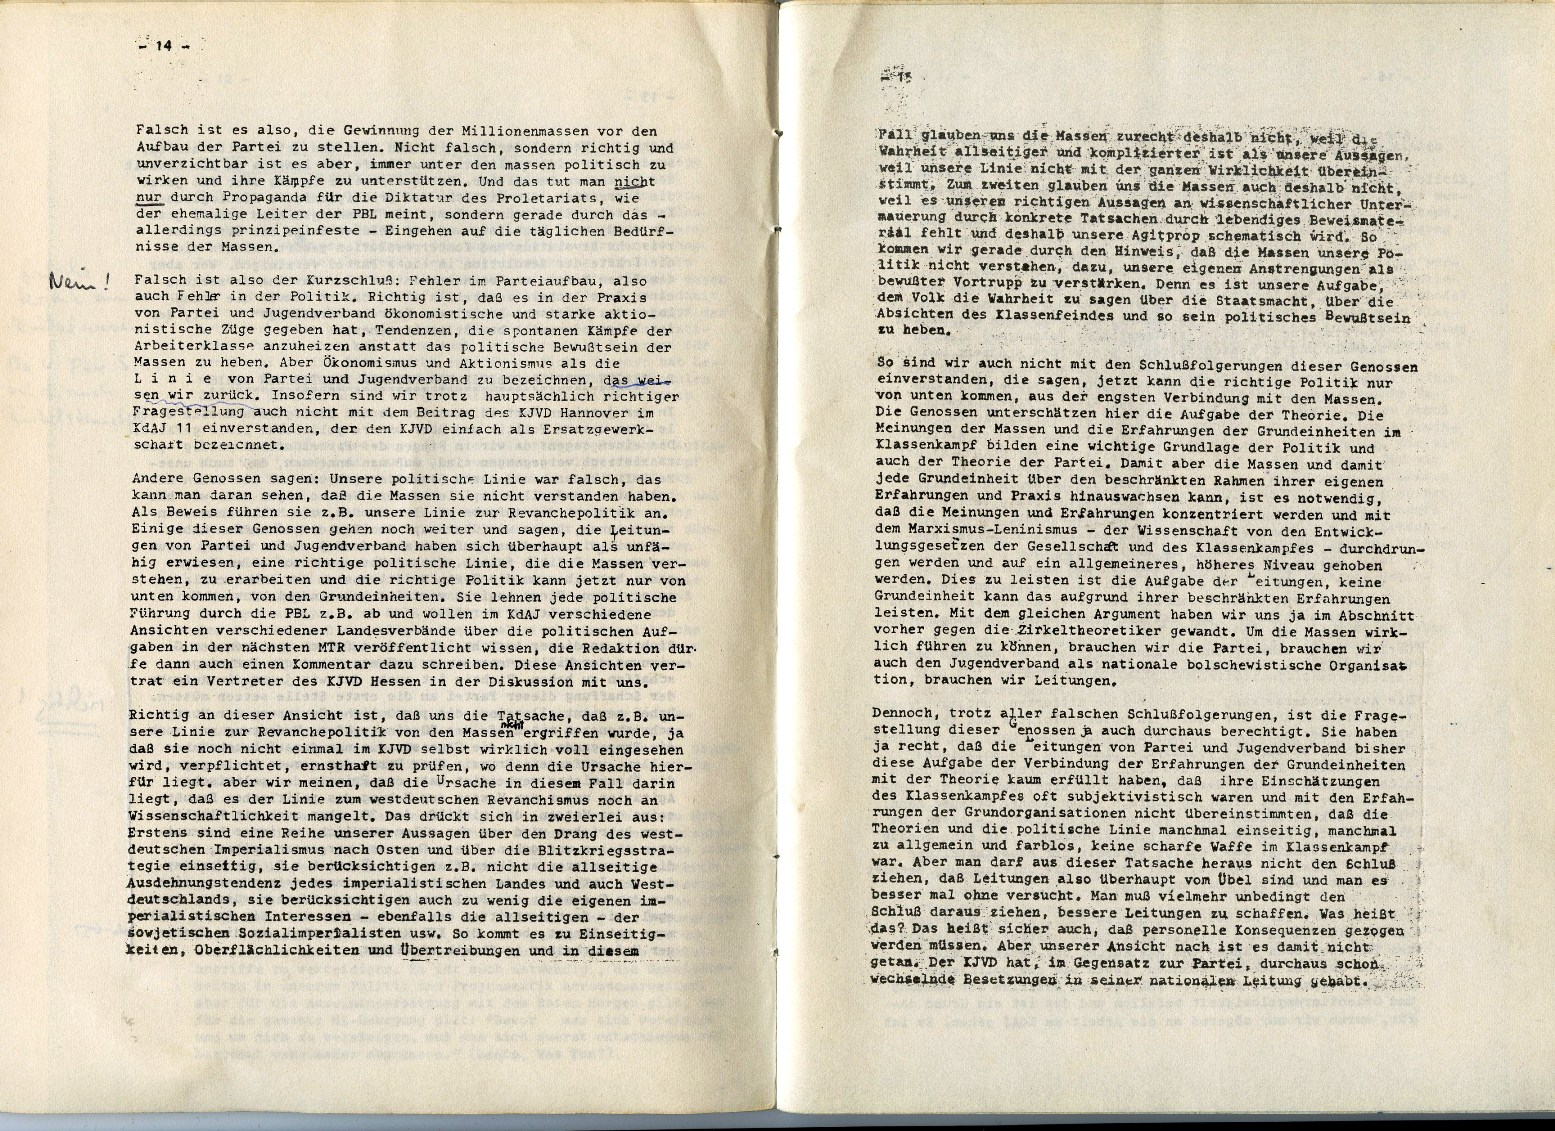 ZB_Universitas_1972_11